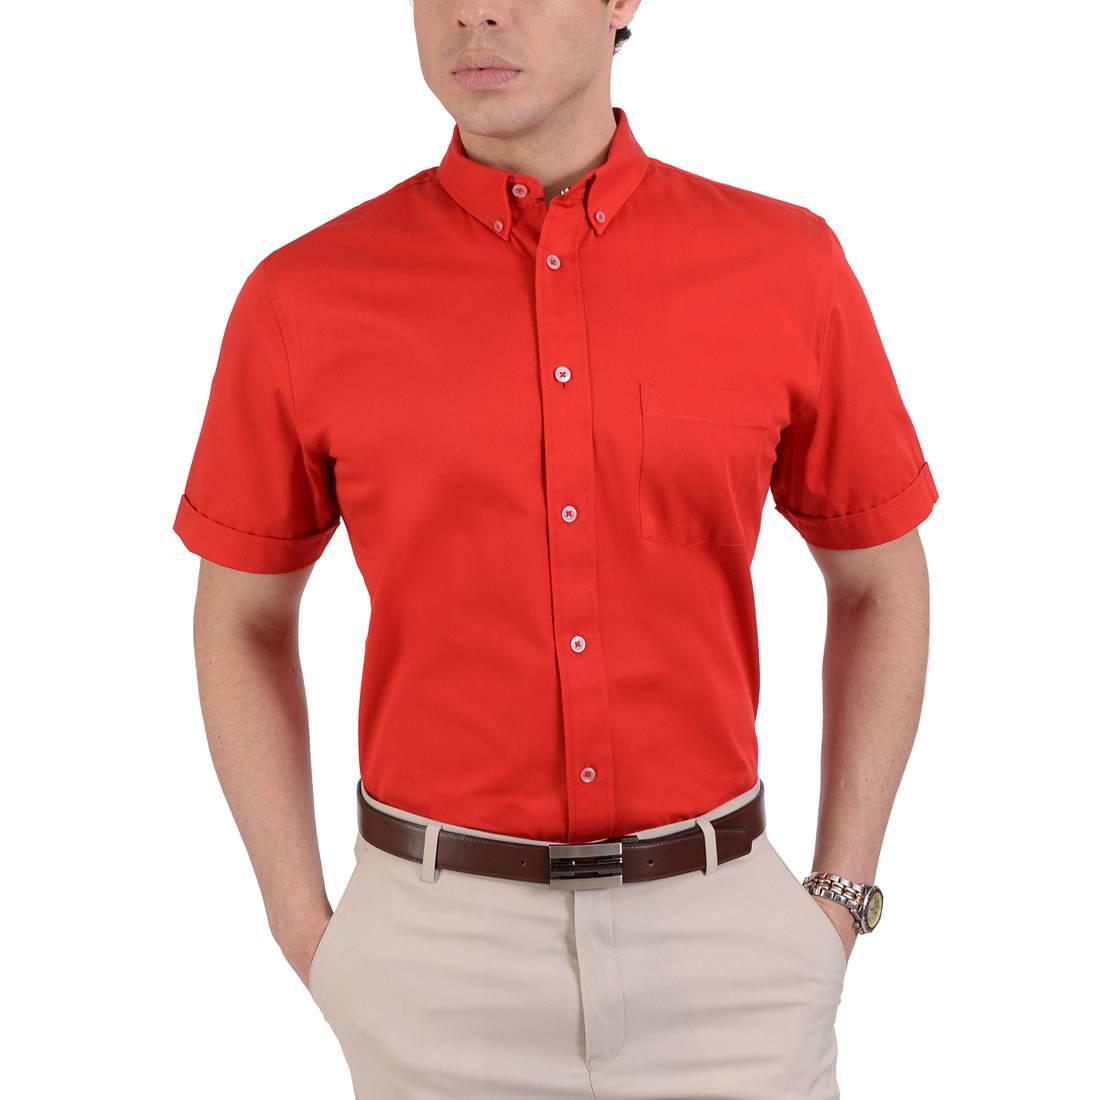 042331381731-01-Camisa-Manga-Corta-classic-Fit-Rojo-yale